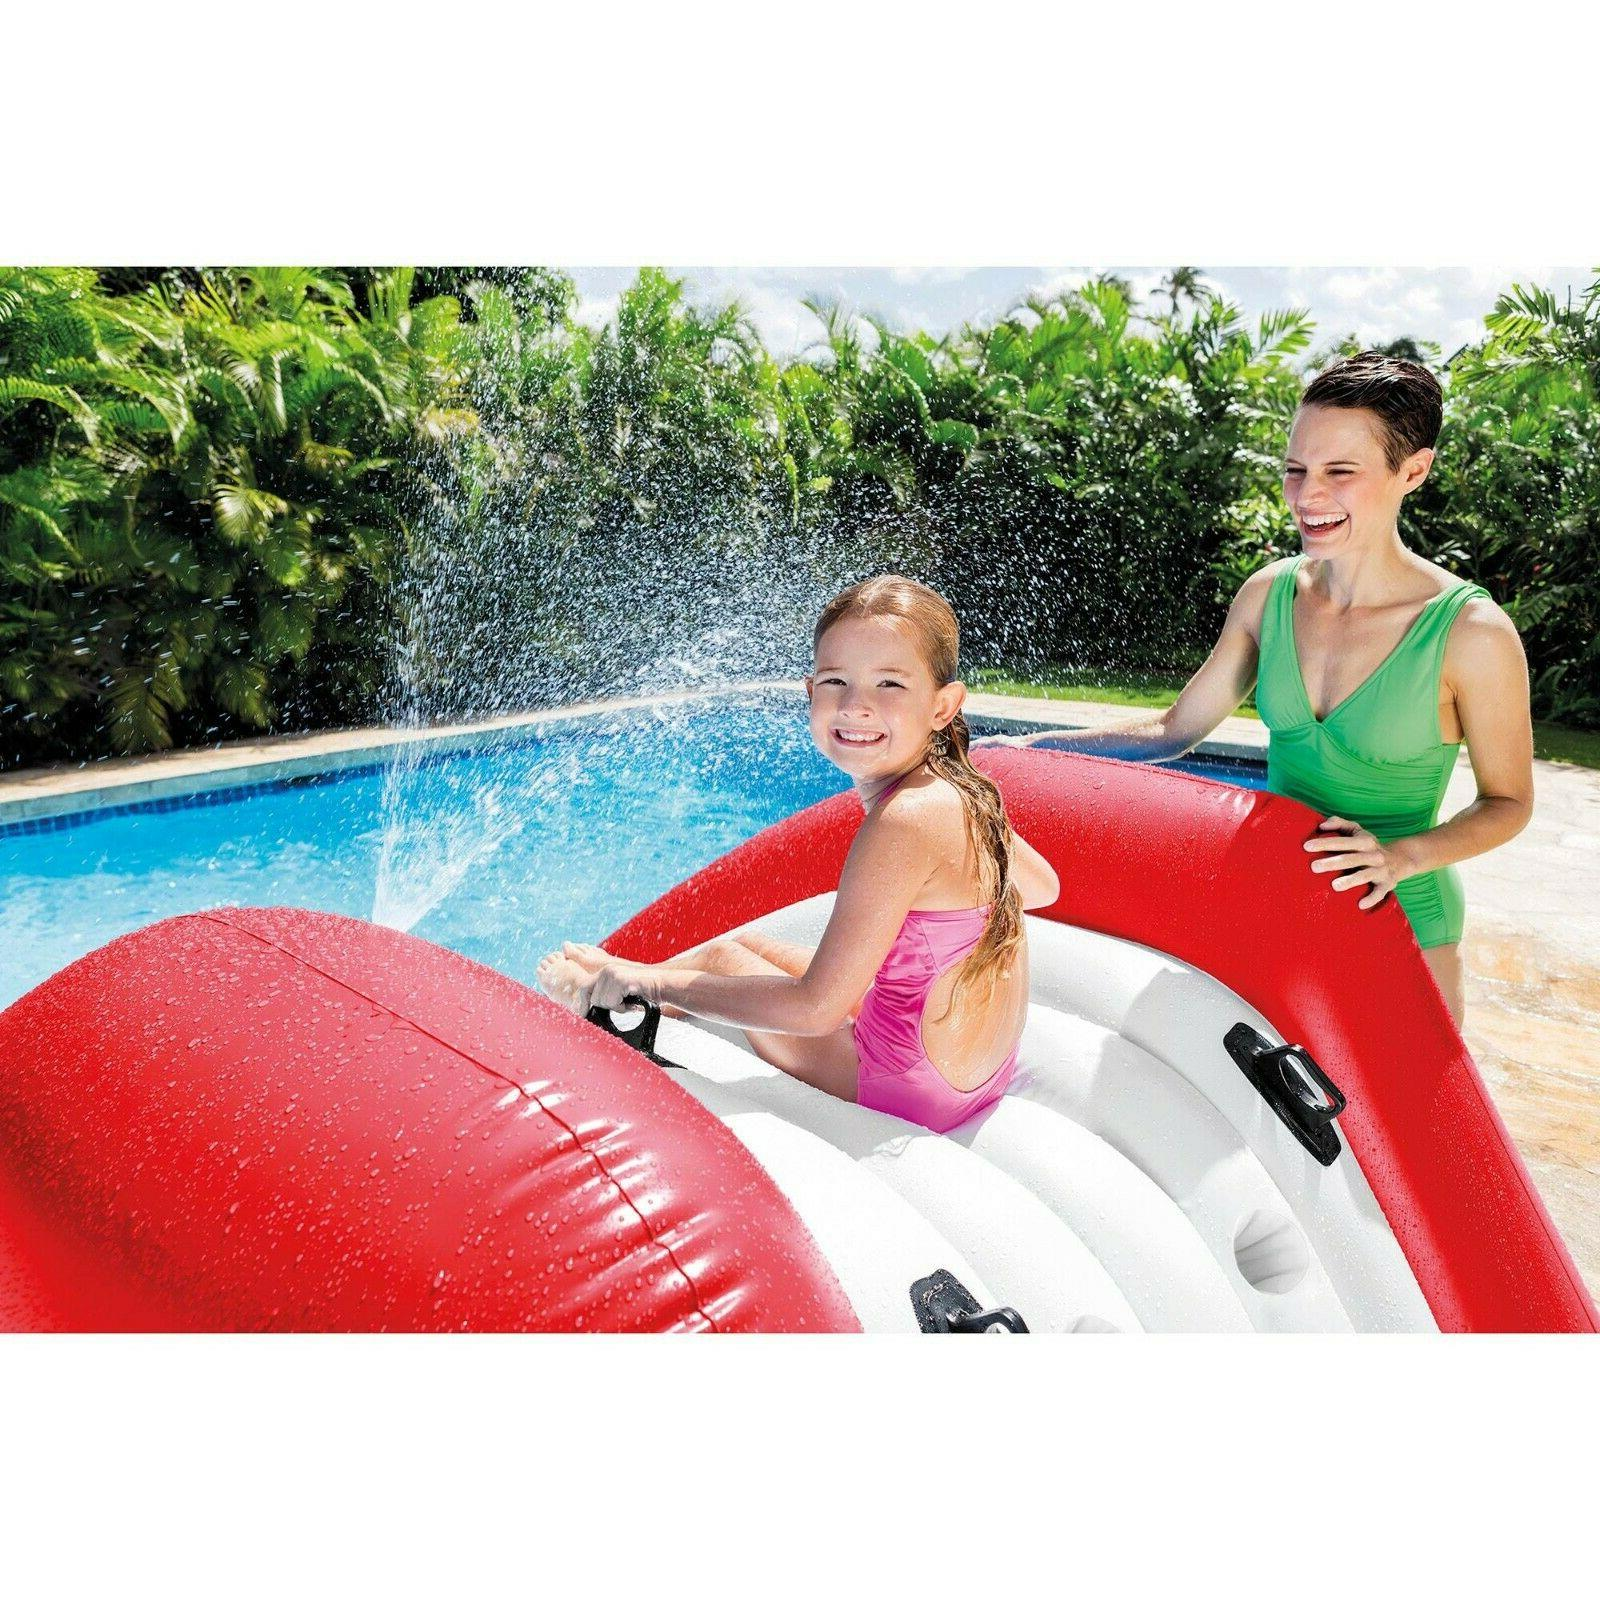 Intex x Kool Inflatable Pool Water w/ Sprayer